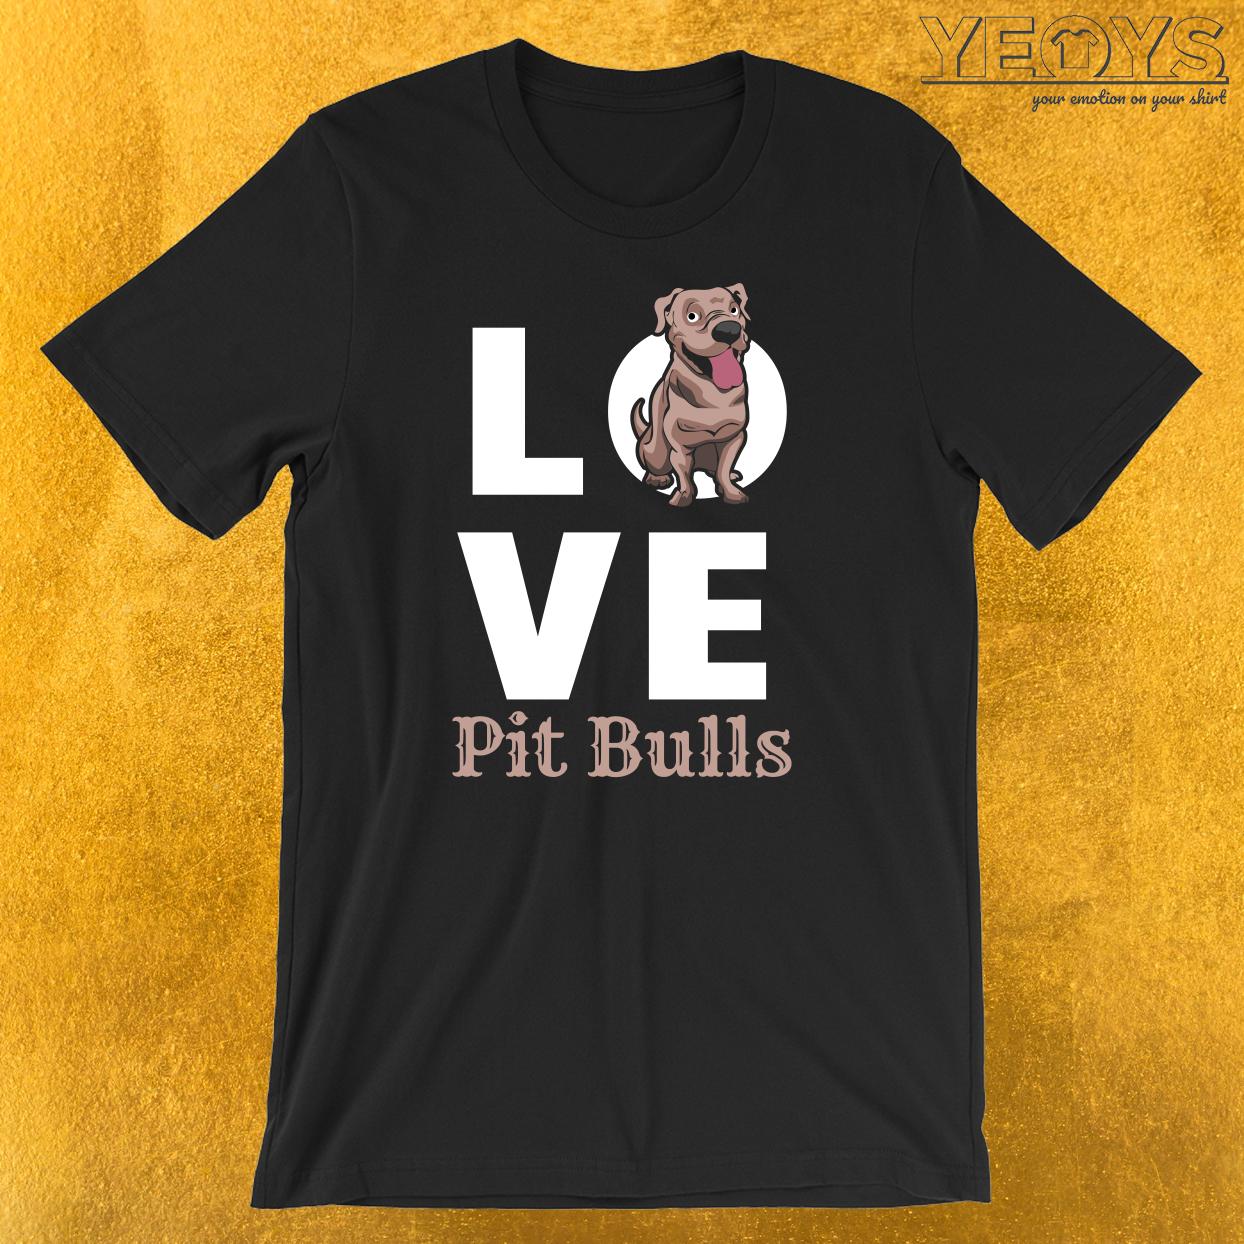 Love Pit Bulls T-Shirt